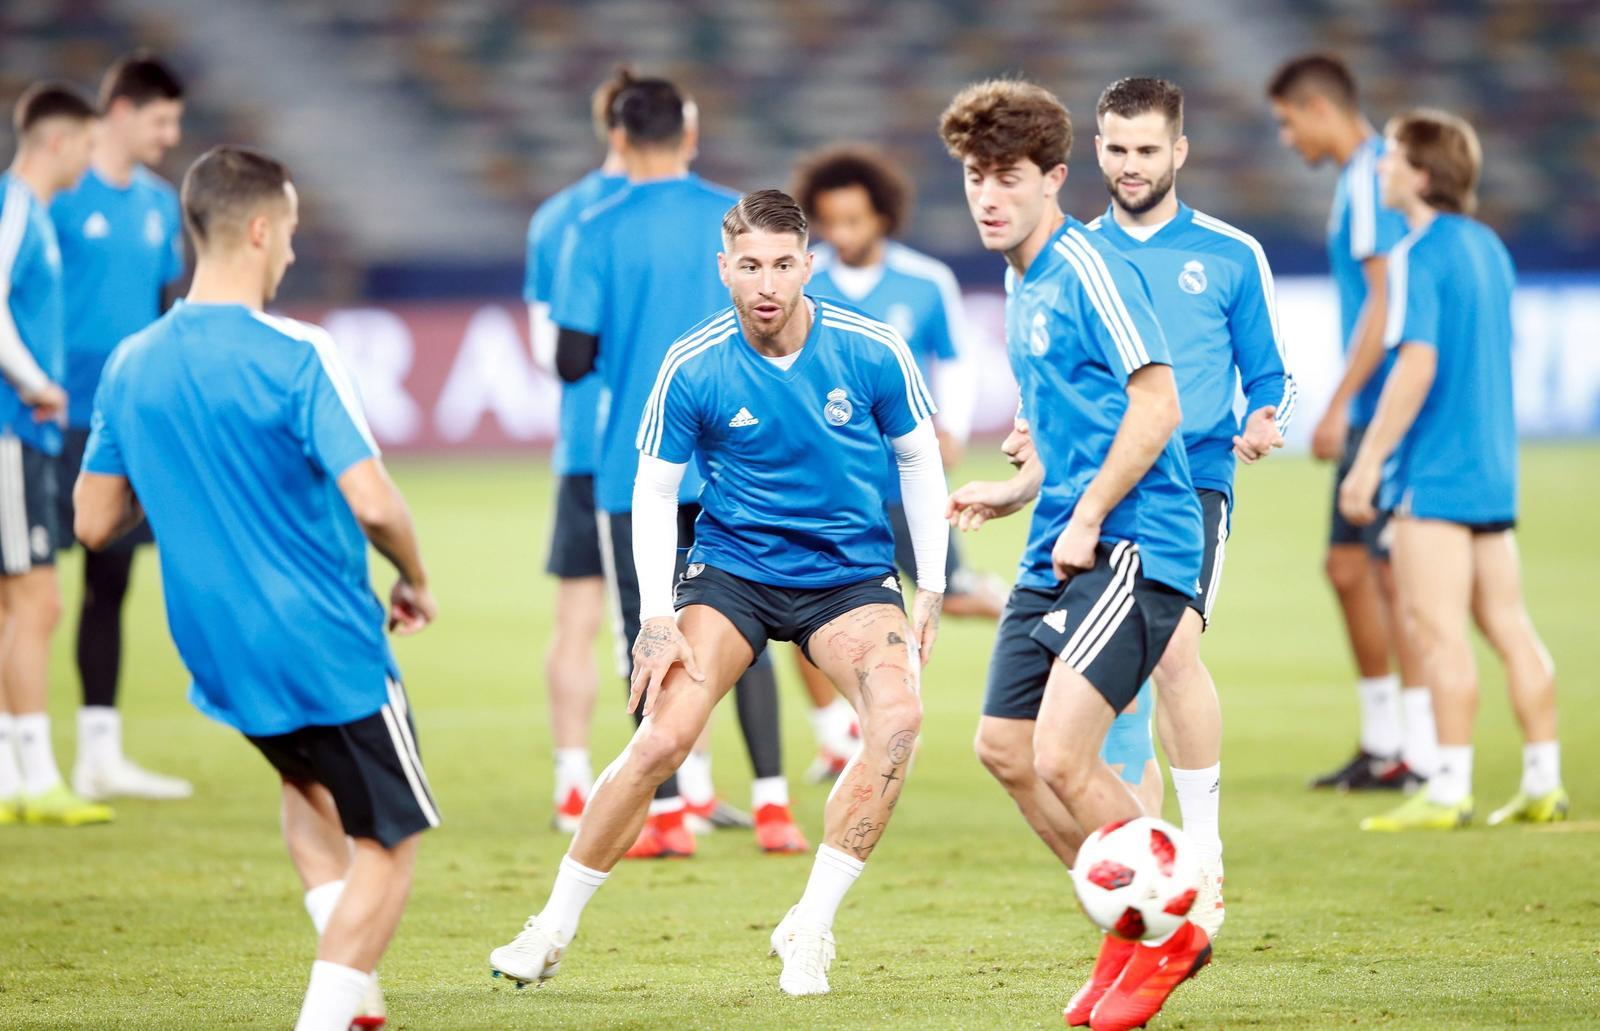 7fea9f91a7788 Real Madrid inicia el camino hacia su tercera corona mundial consecutiva  (hoy